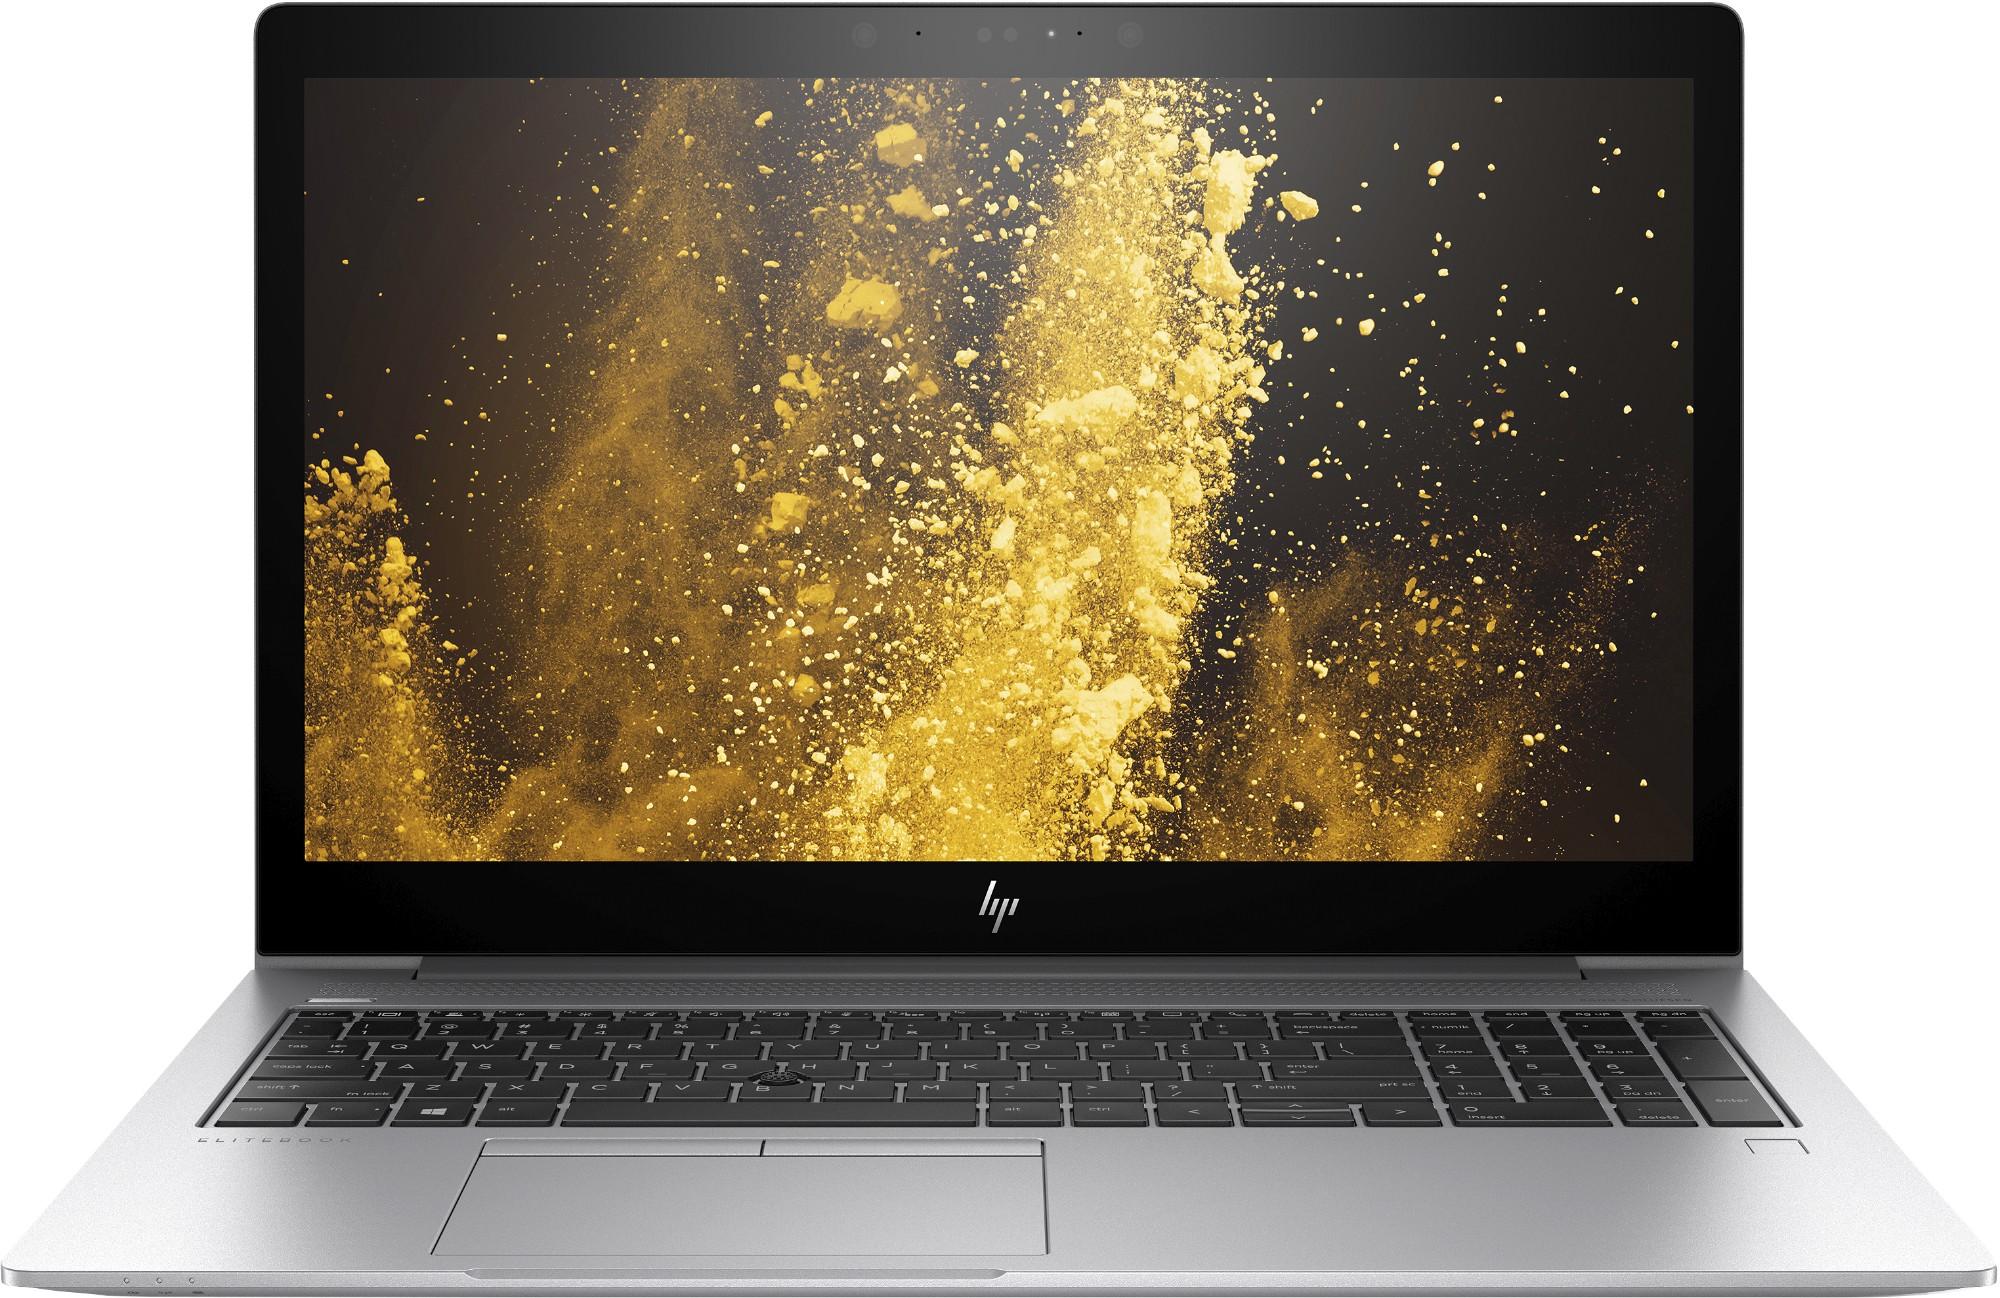 "HP EliteBook 850 G5 Silver Notebook 39.6 cm (15.6"") 1920 x 1080 pixels 8th gen Intel® Core™ i7 16 GB DDR4-SDRAM 512 GB SSD 3G 4G Windows 10 Pro"